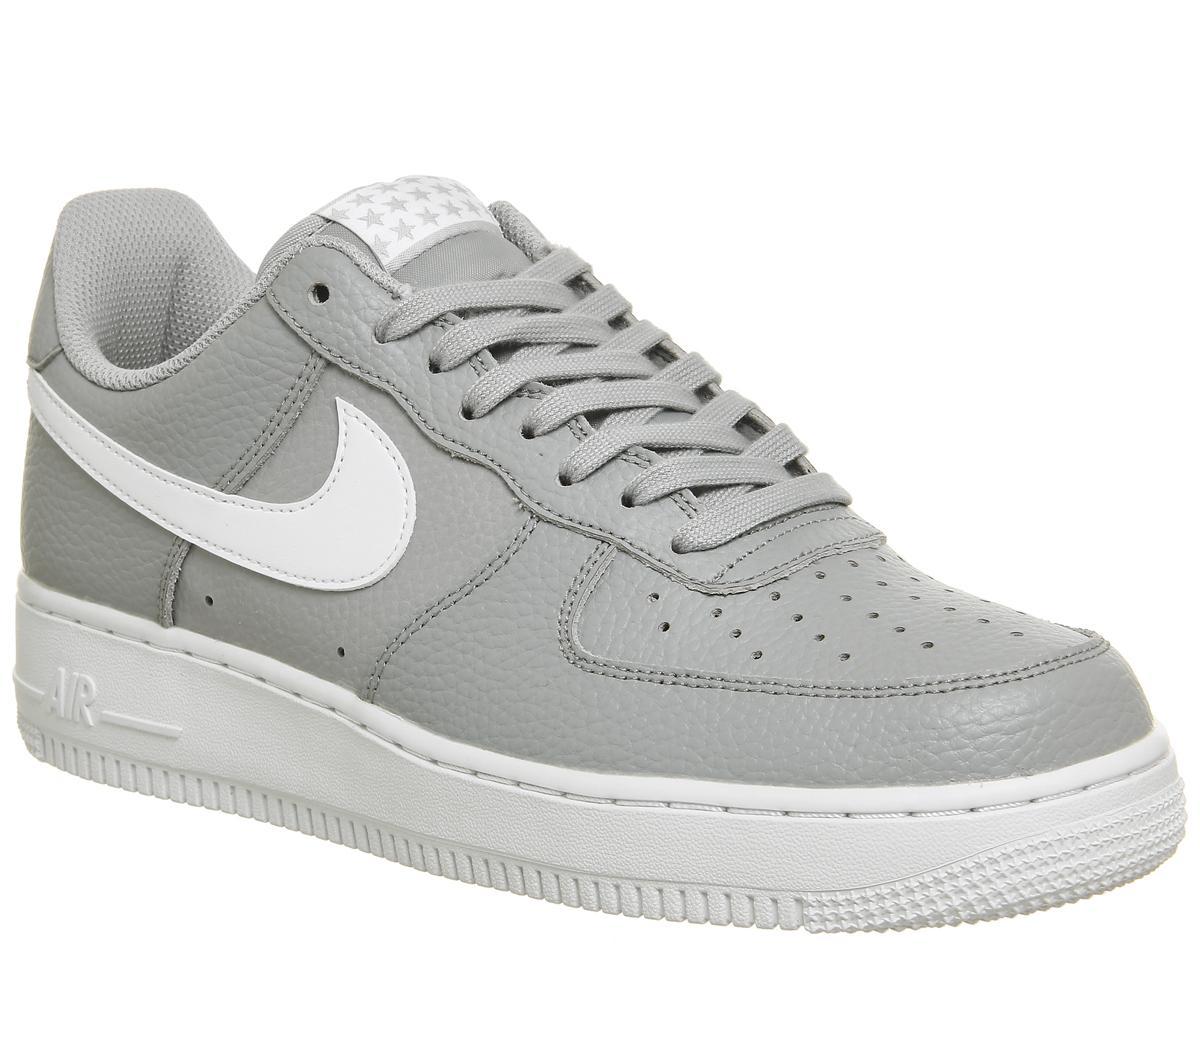 nike air force 1 07 grey